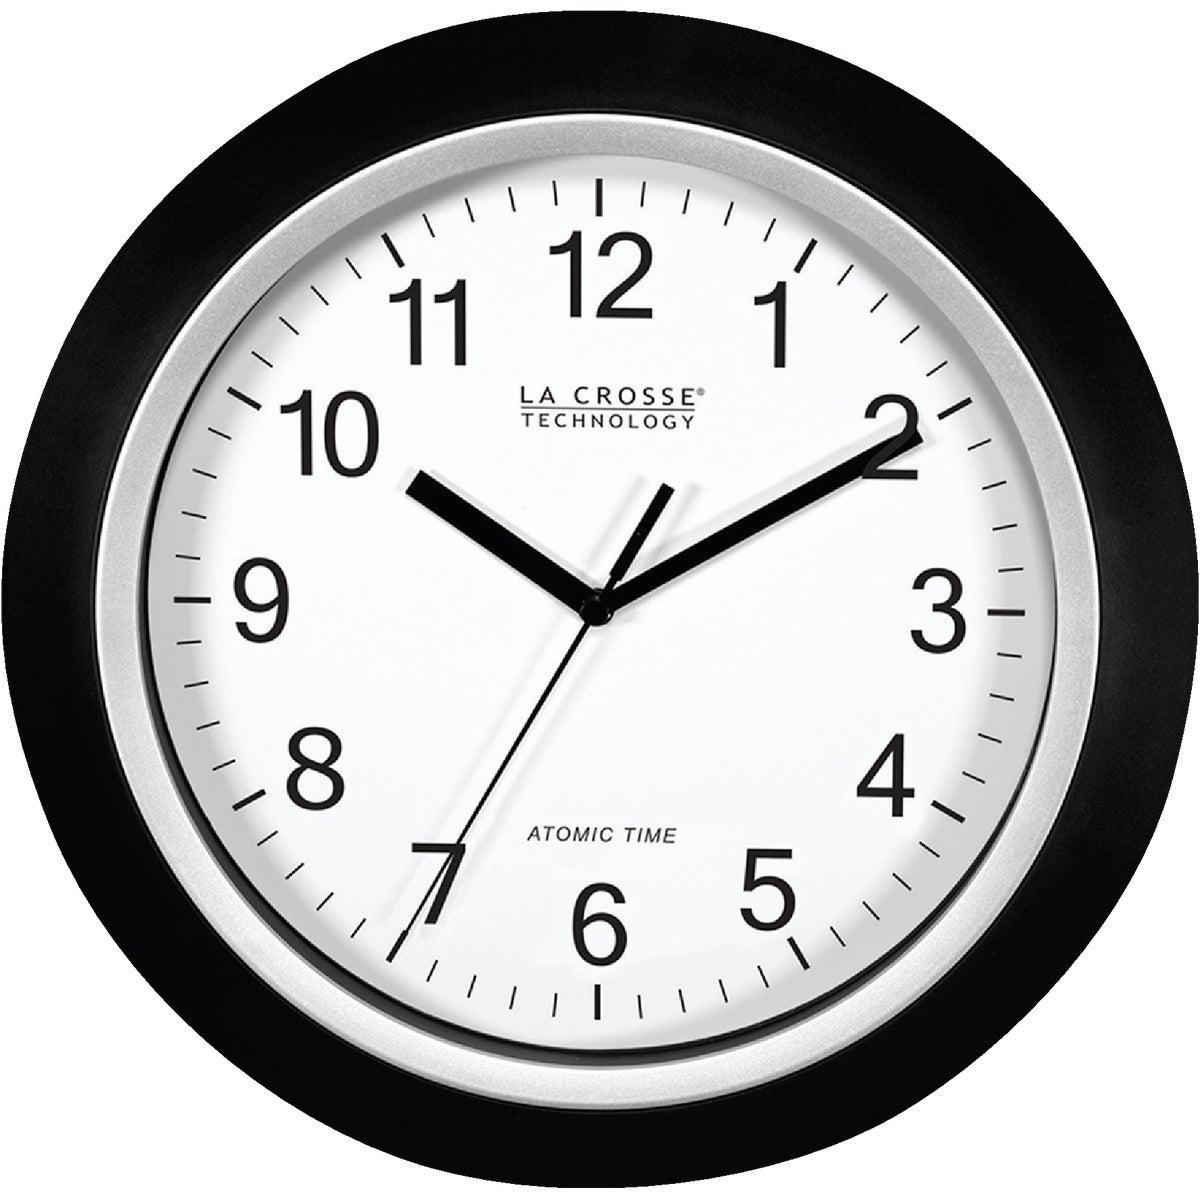 "12"" ATOMIC WALL CLOCK - WT-3129B by Lacrosse Technology"